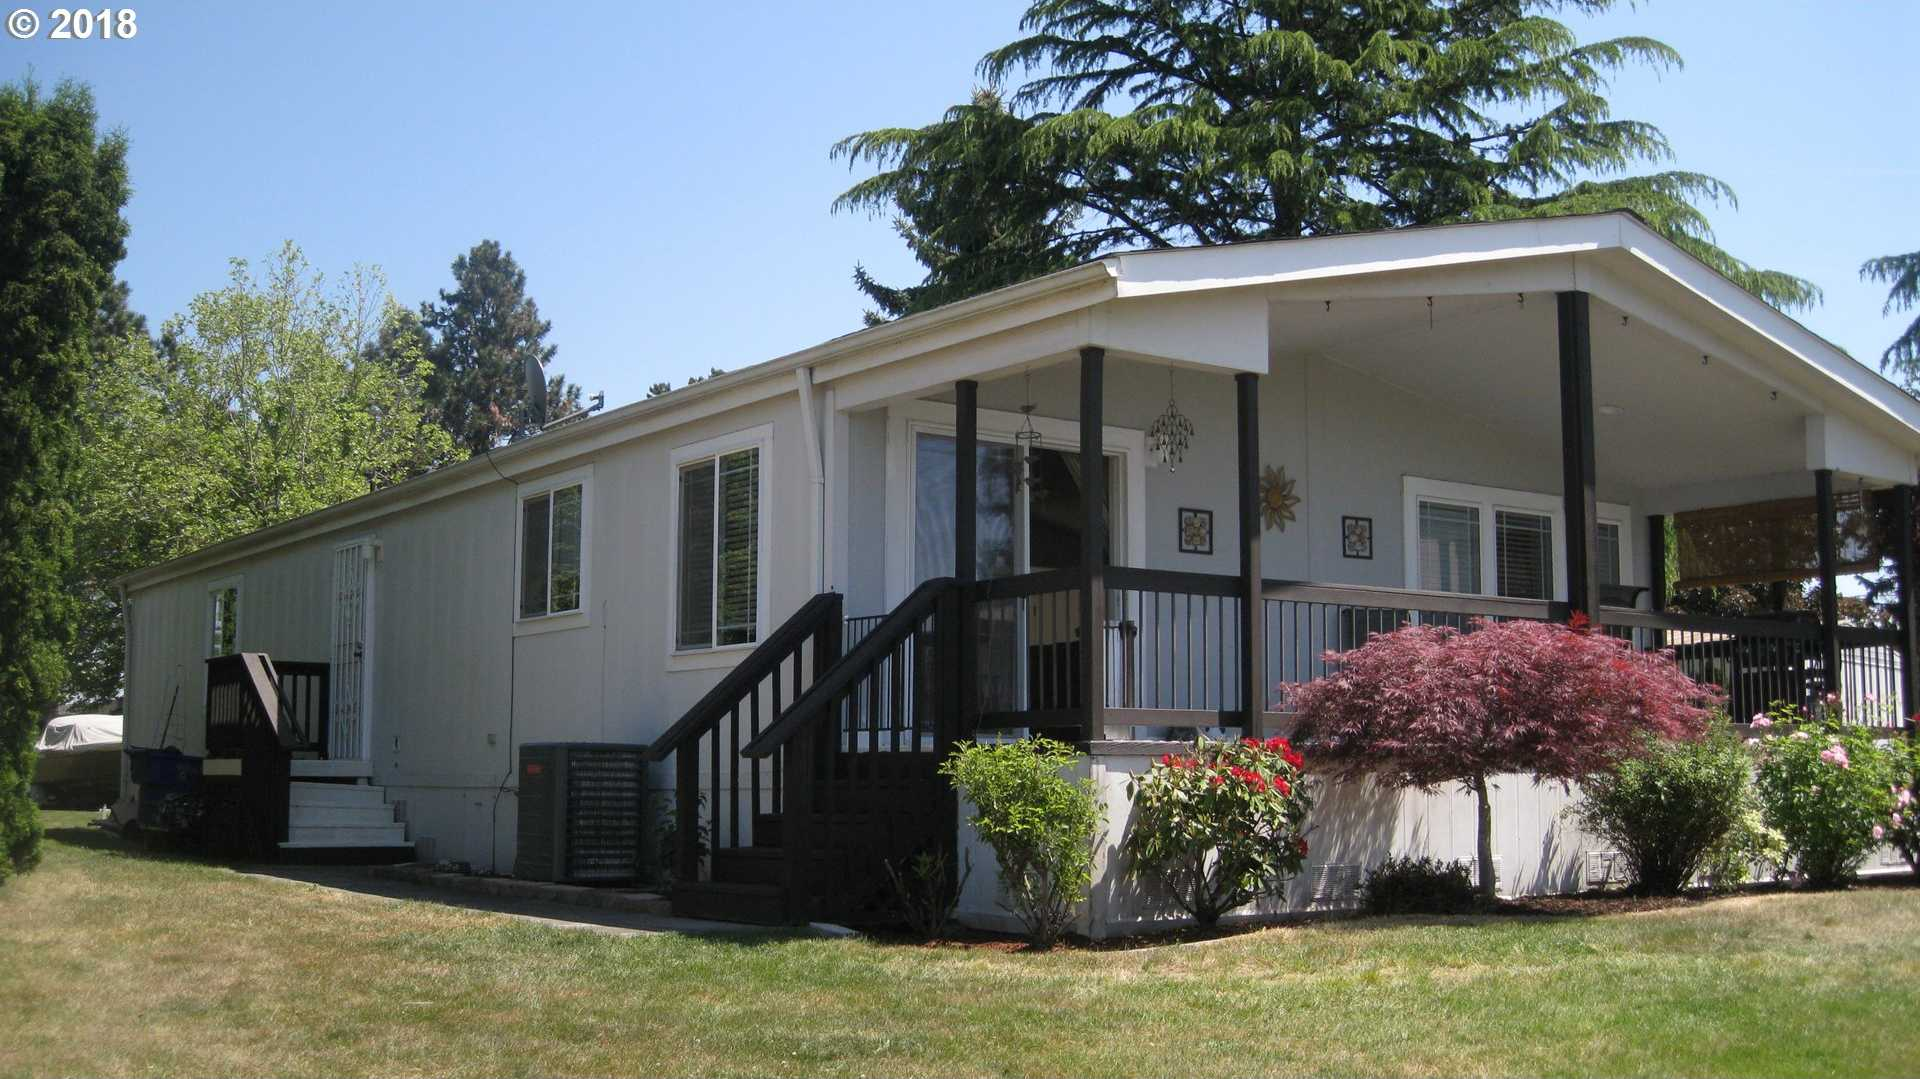 $98,500 - 3Br/2Ba -  for Sale in Hayden Island / Jantzen Beach, Portland